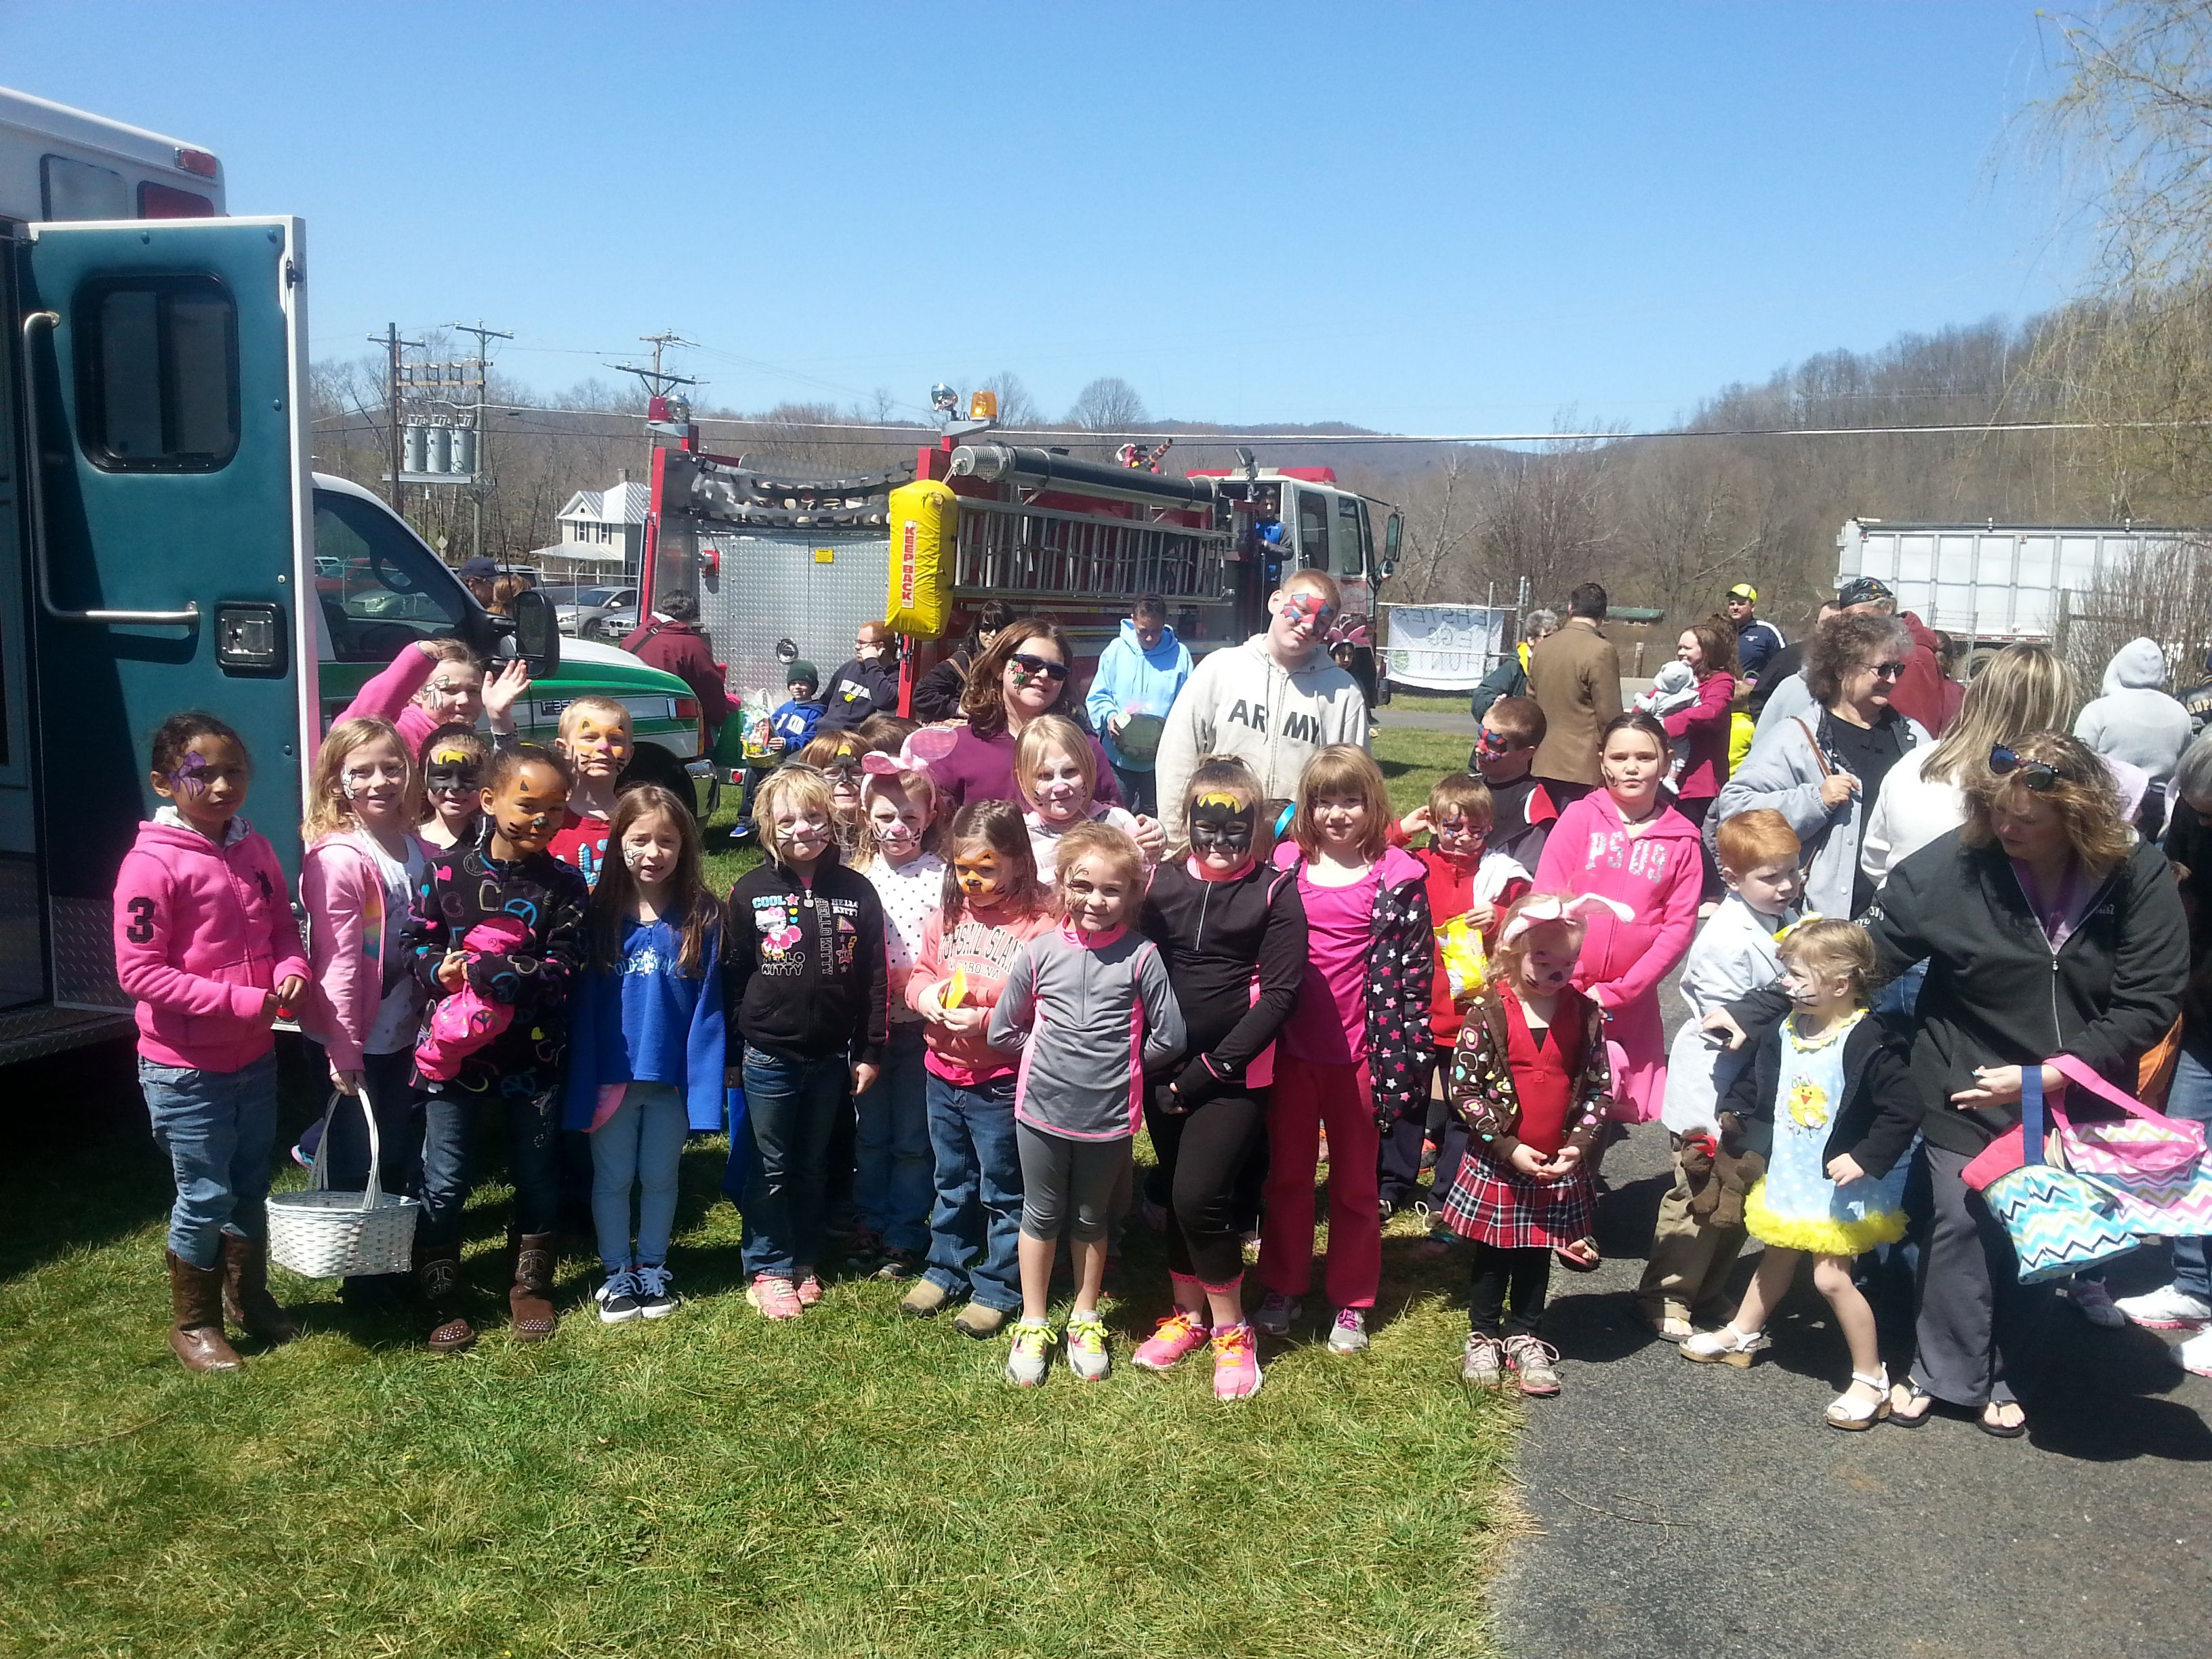 2nd Annual Sugar Grove Community Easter Egg Hunt Egg